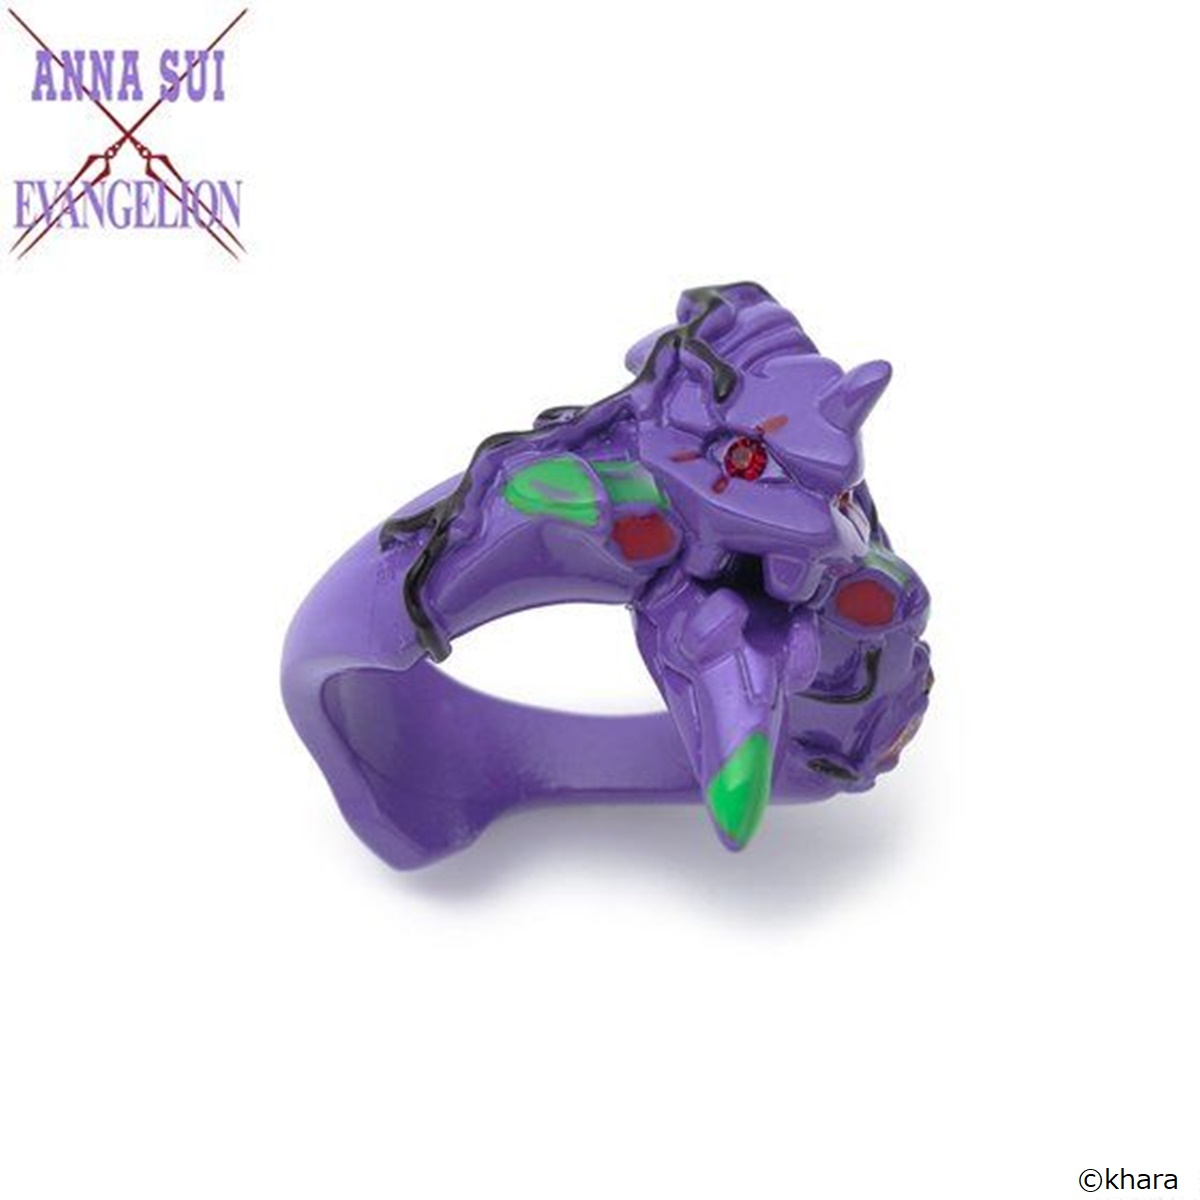 Evangelion: EVA-01 Ring—Evangelion/Anna Sui Collaboration